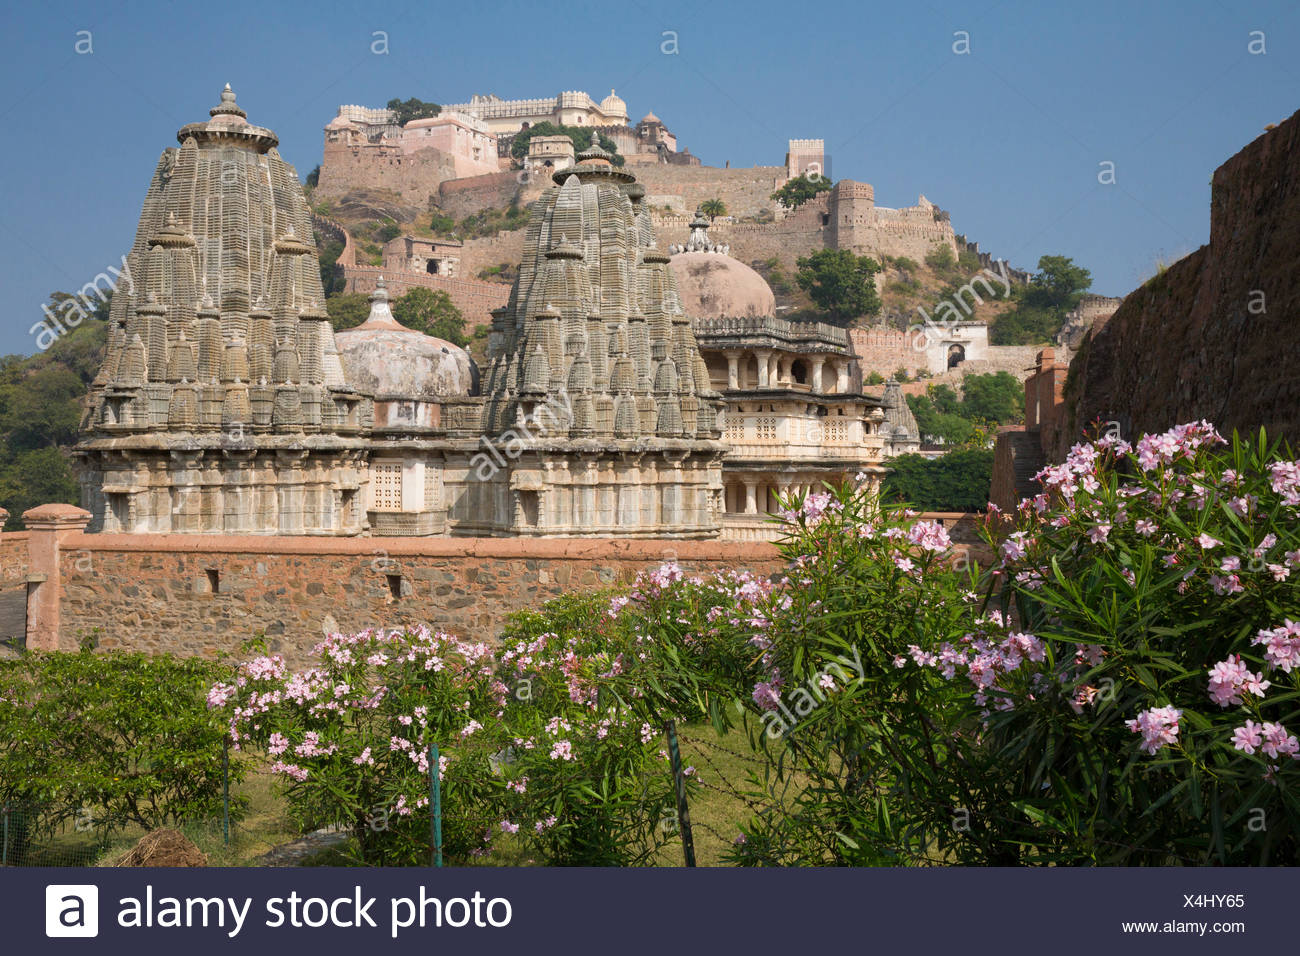 Fort, Kumbhalgarh, Rajasthan, Wand, gerahmt, Asien, Indien, Stockbild